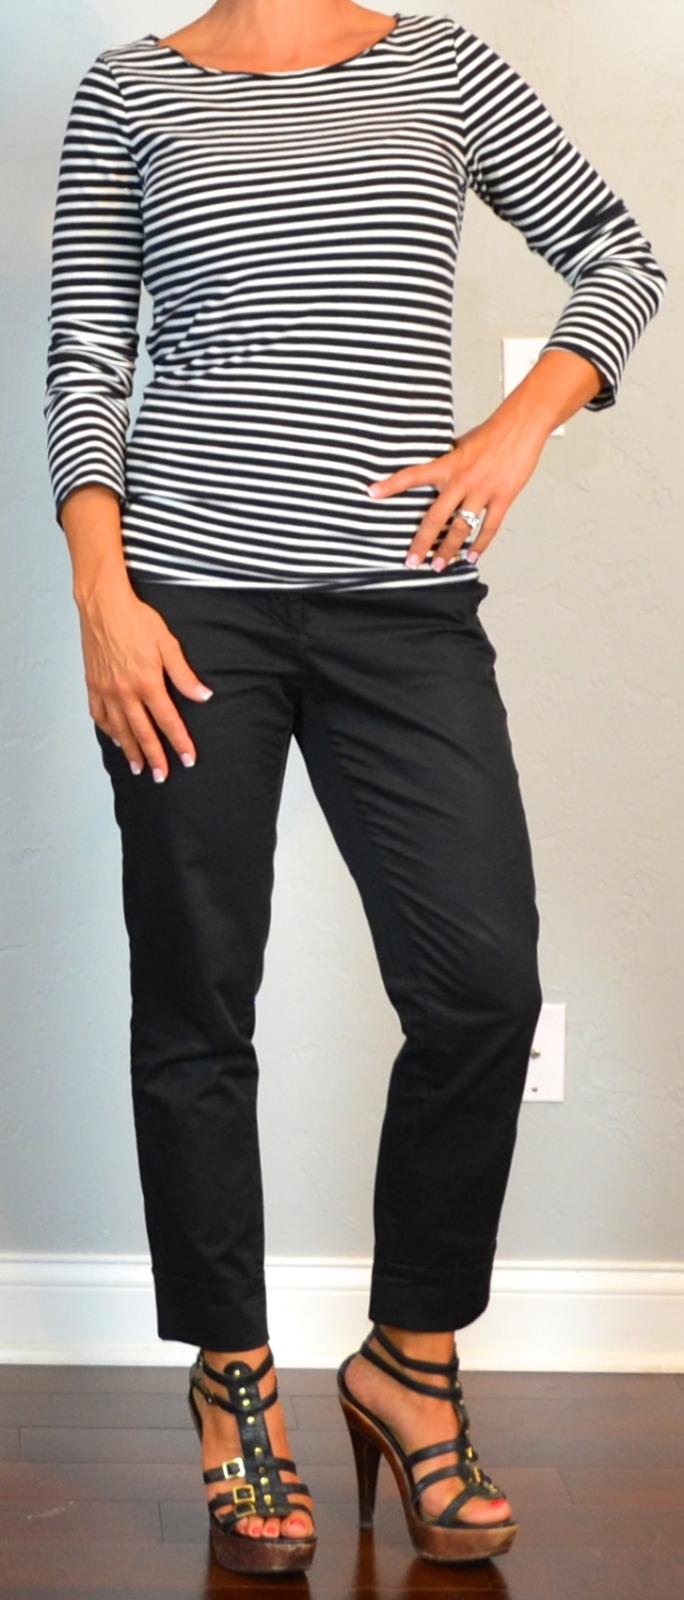 4c70af5a367f outfit post: striped long sleeved shirt, black ankle pants, gladiator heels